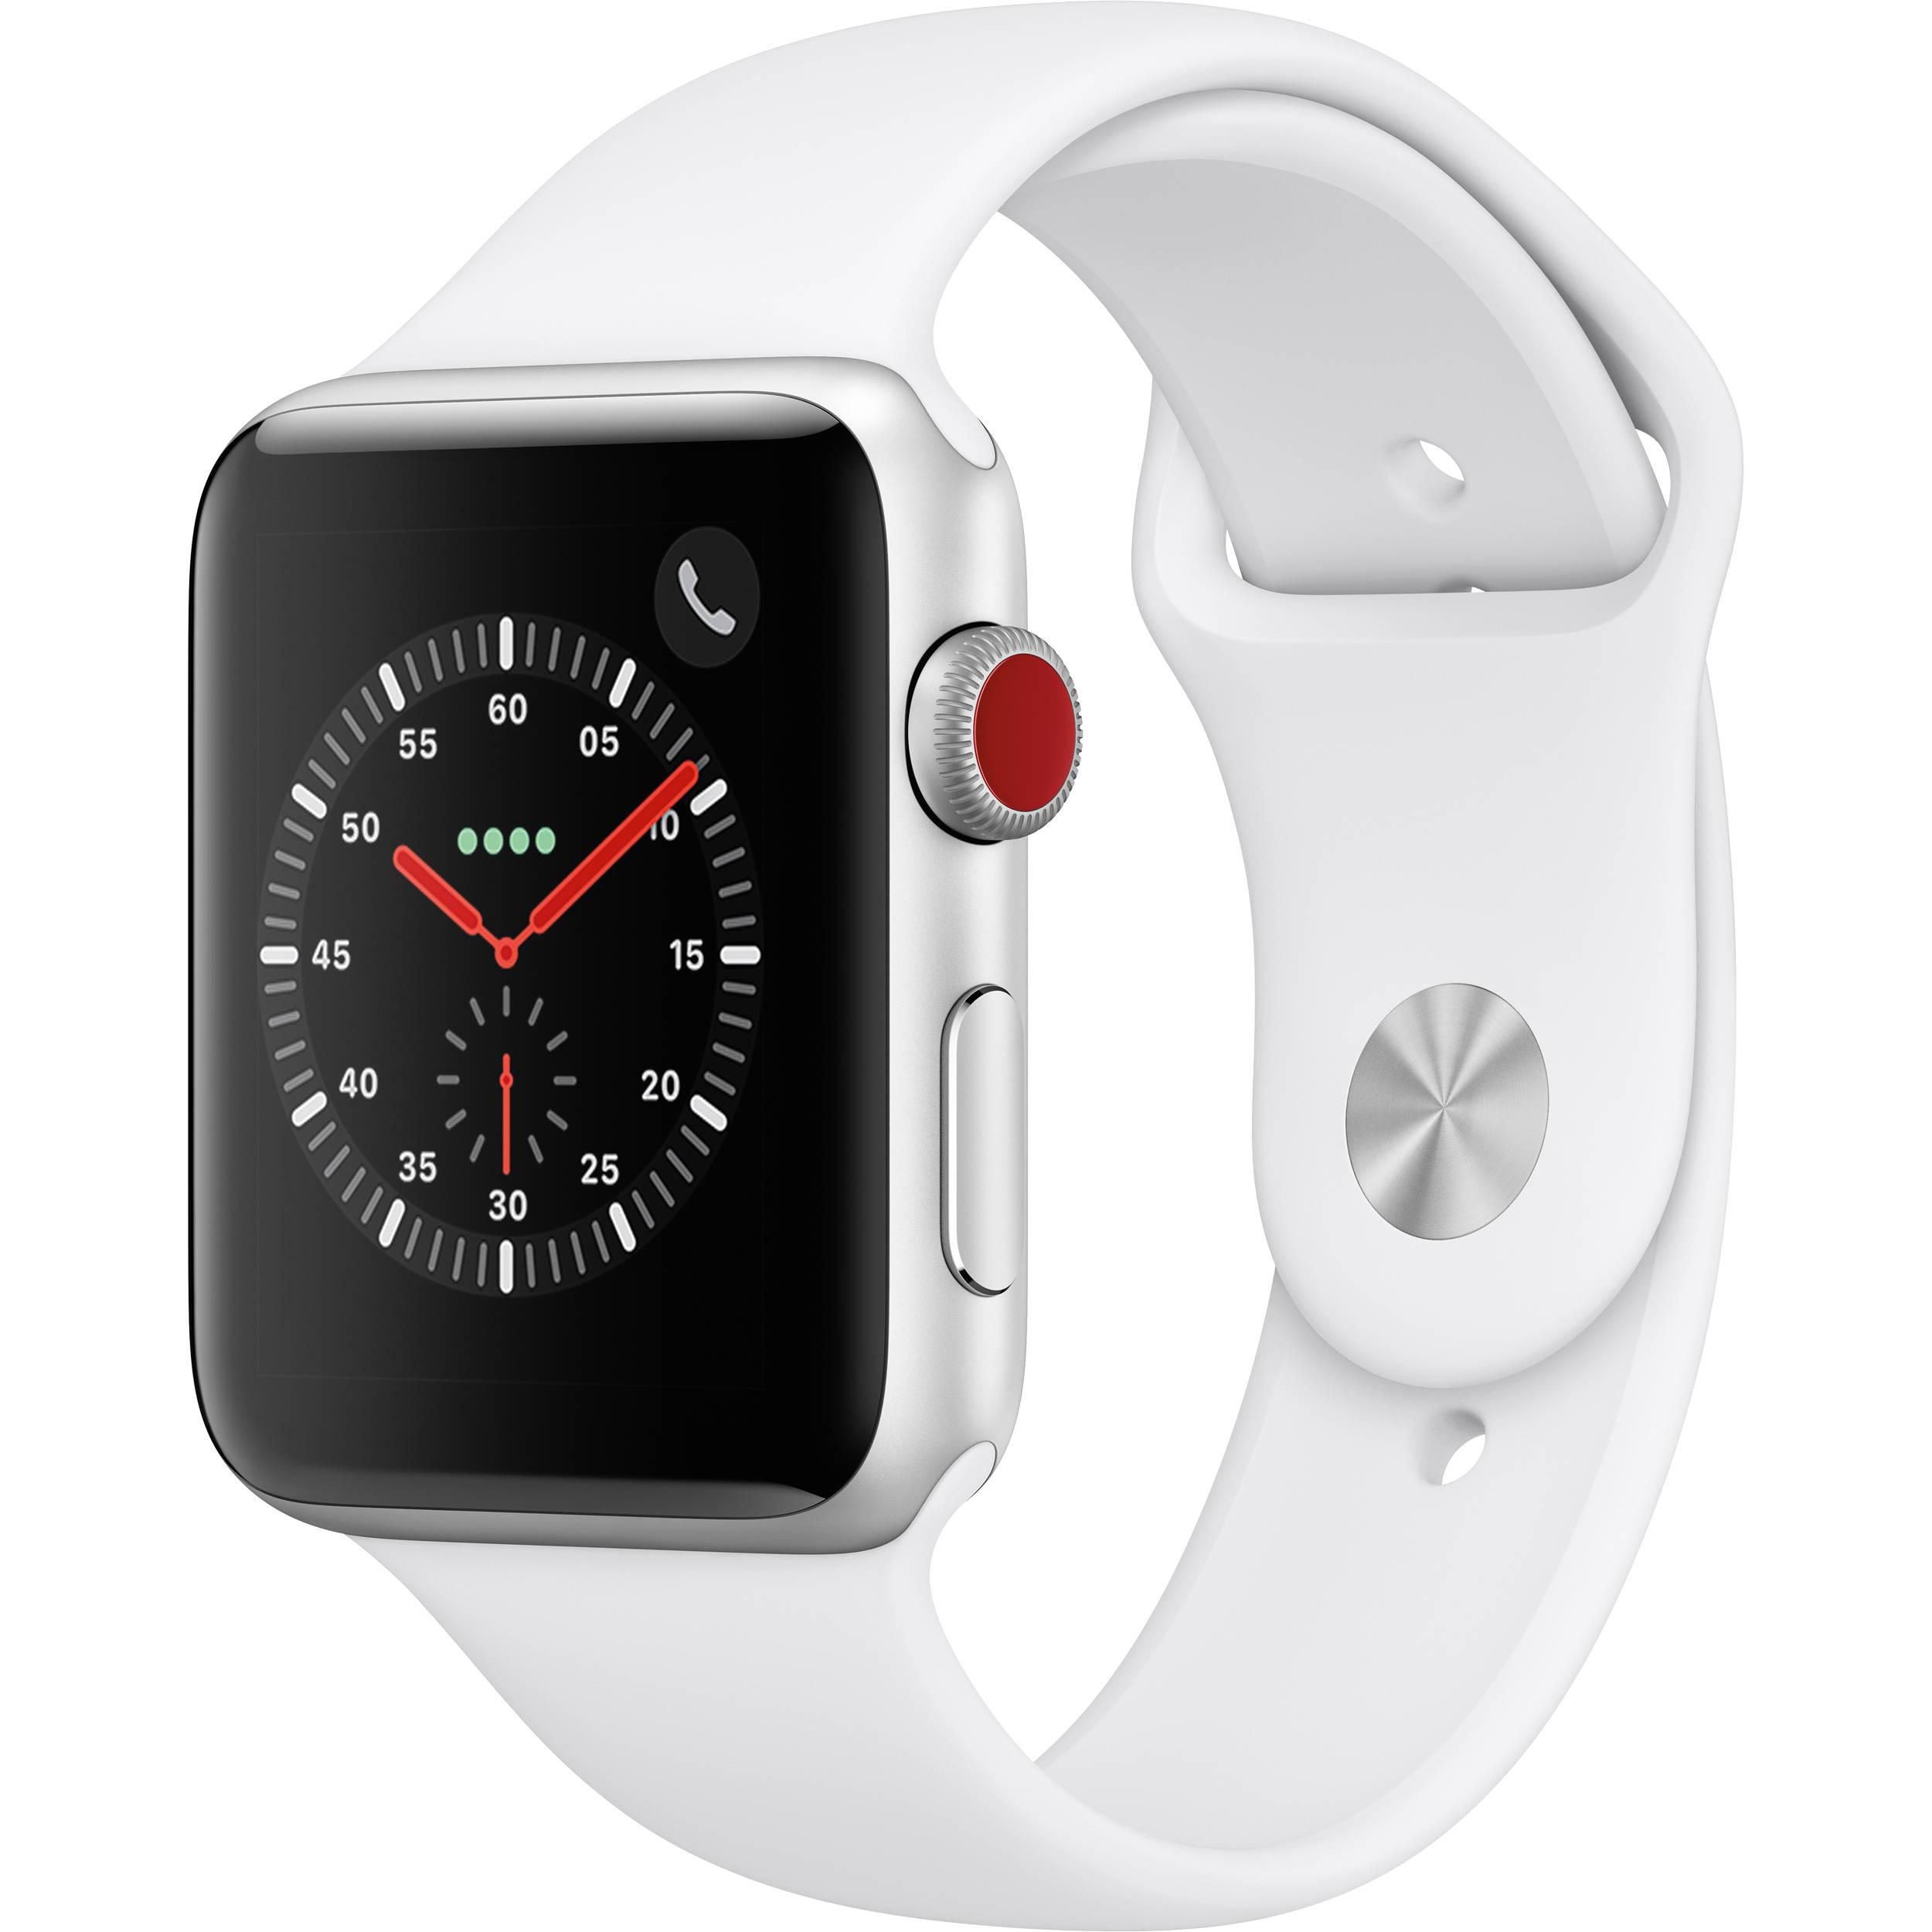 finest selection 06438 e4de8 Apple Watch Series 3 42mm Smartwatch (GPS + Cellular, Silver Aluminum Case,  White Sport Band)